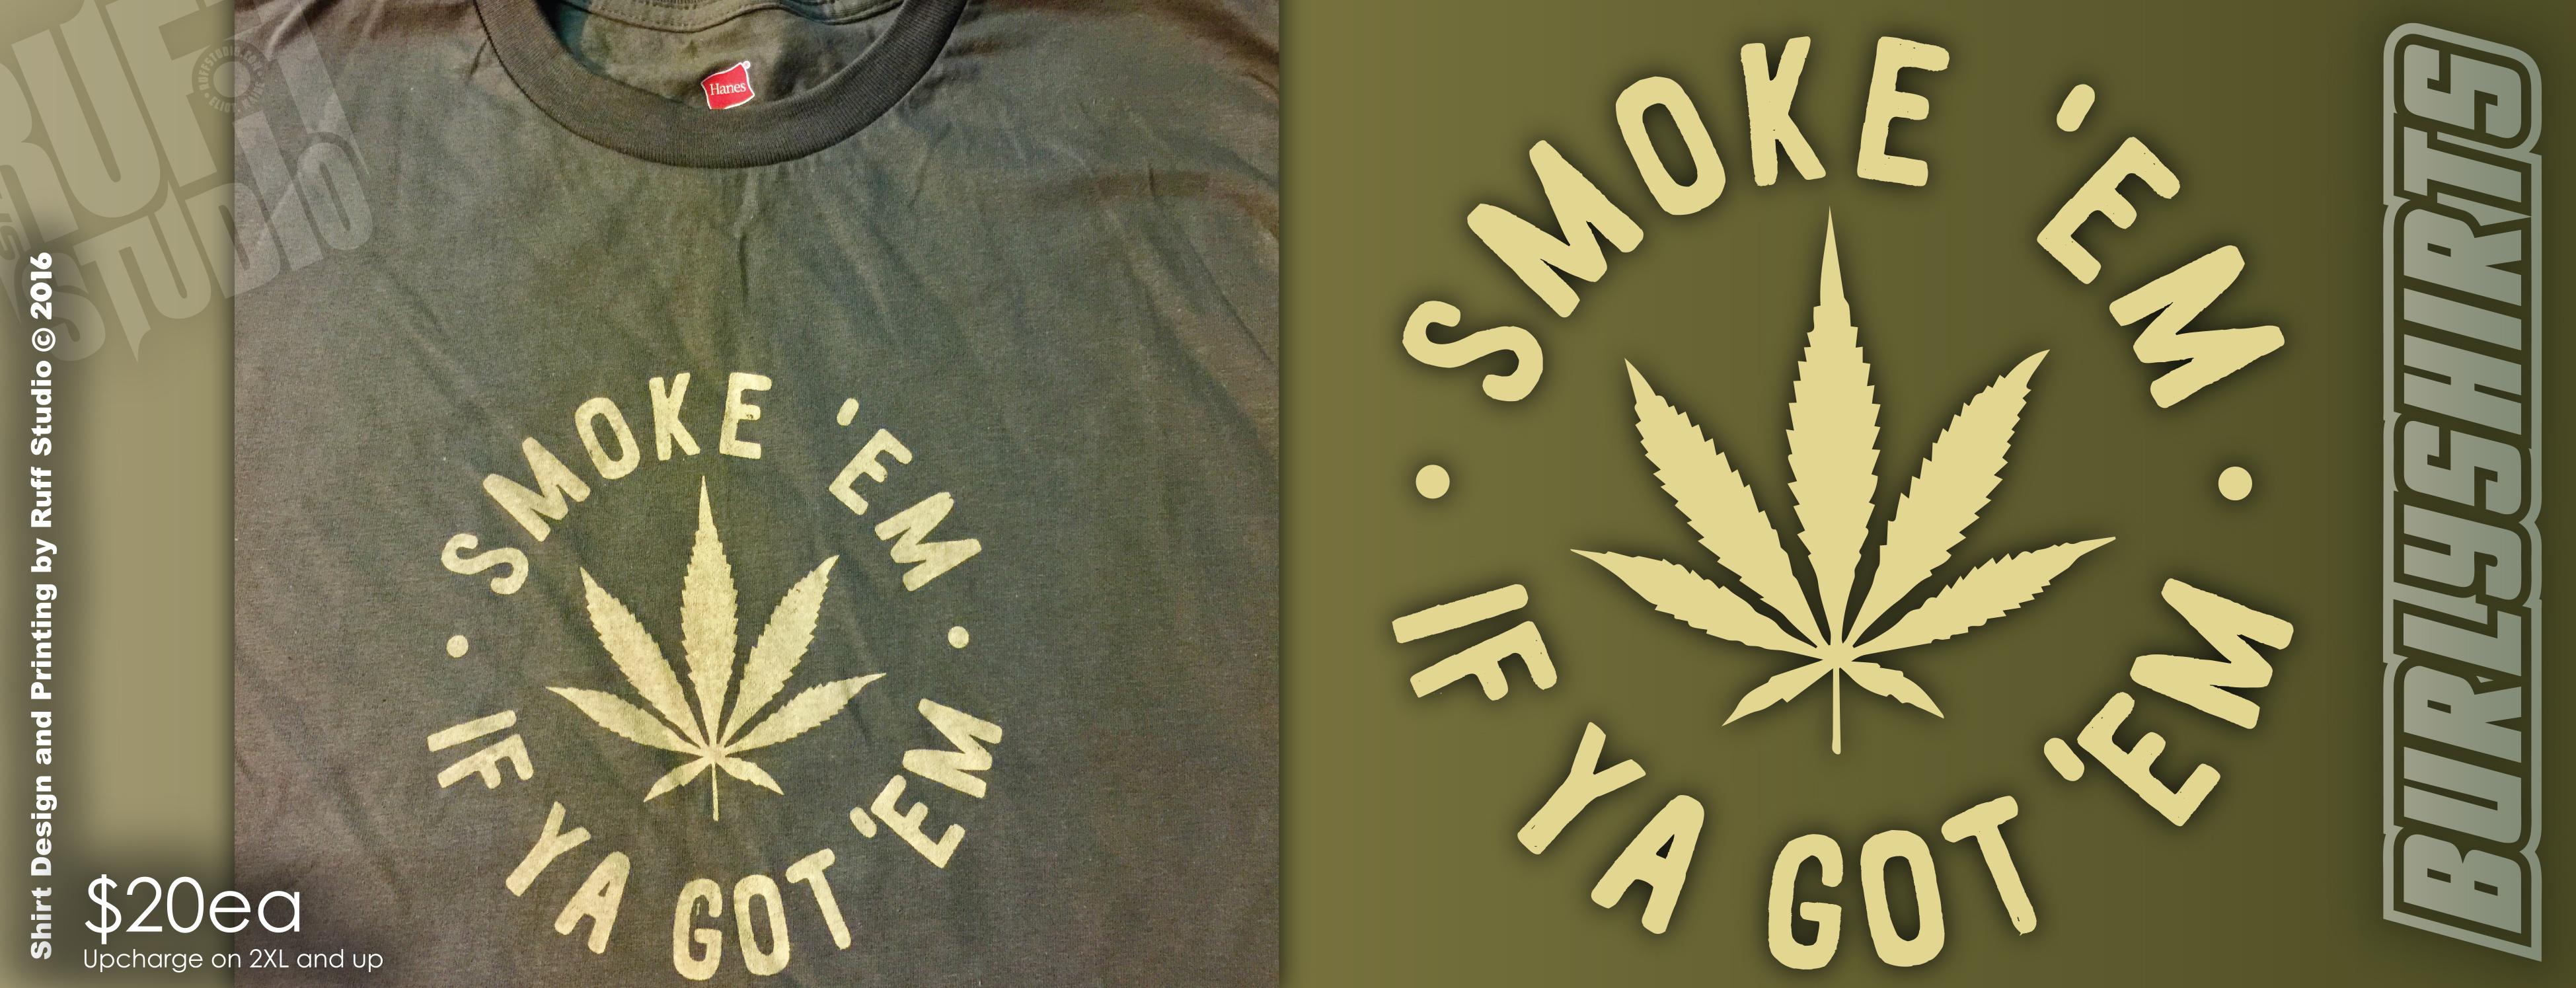 smoke-em-ad1a.jpg